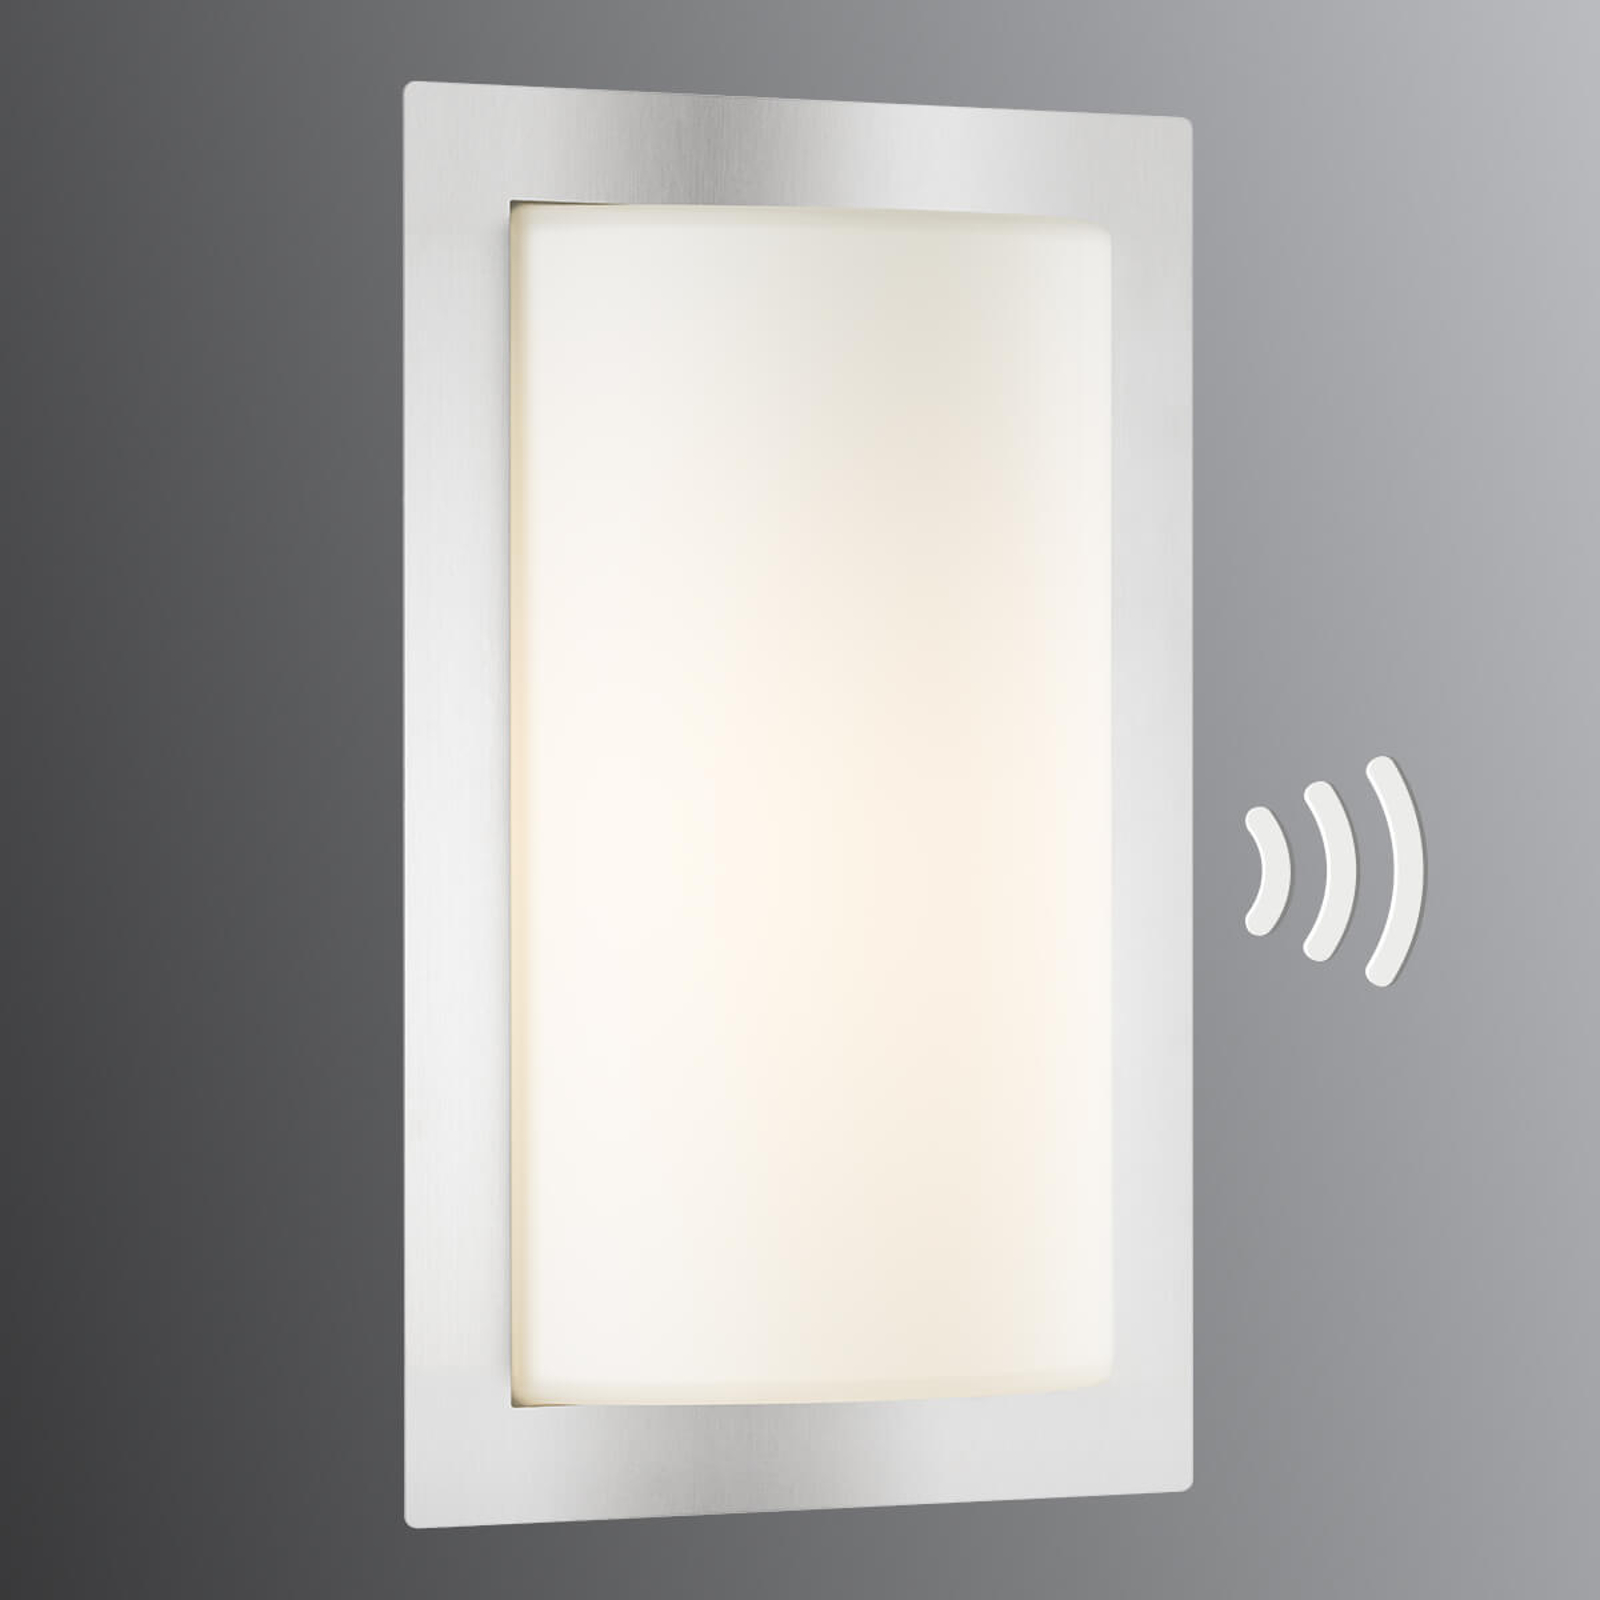 Moderne sensor-buitenwandlamp Luis